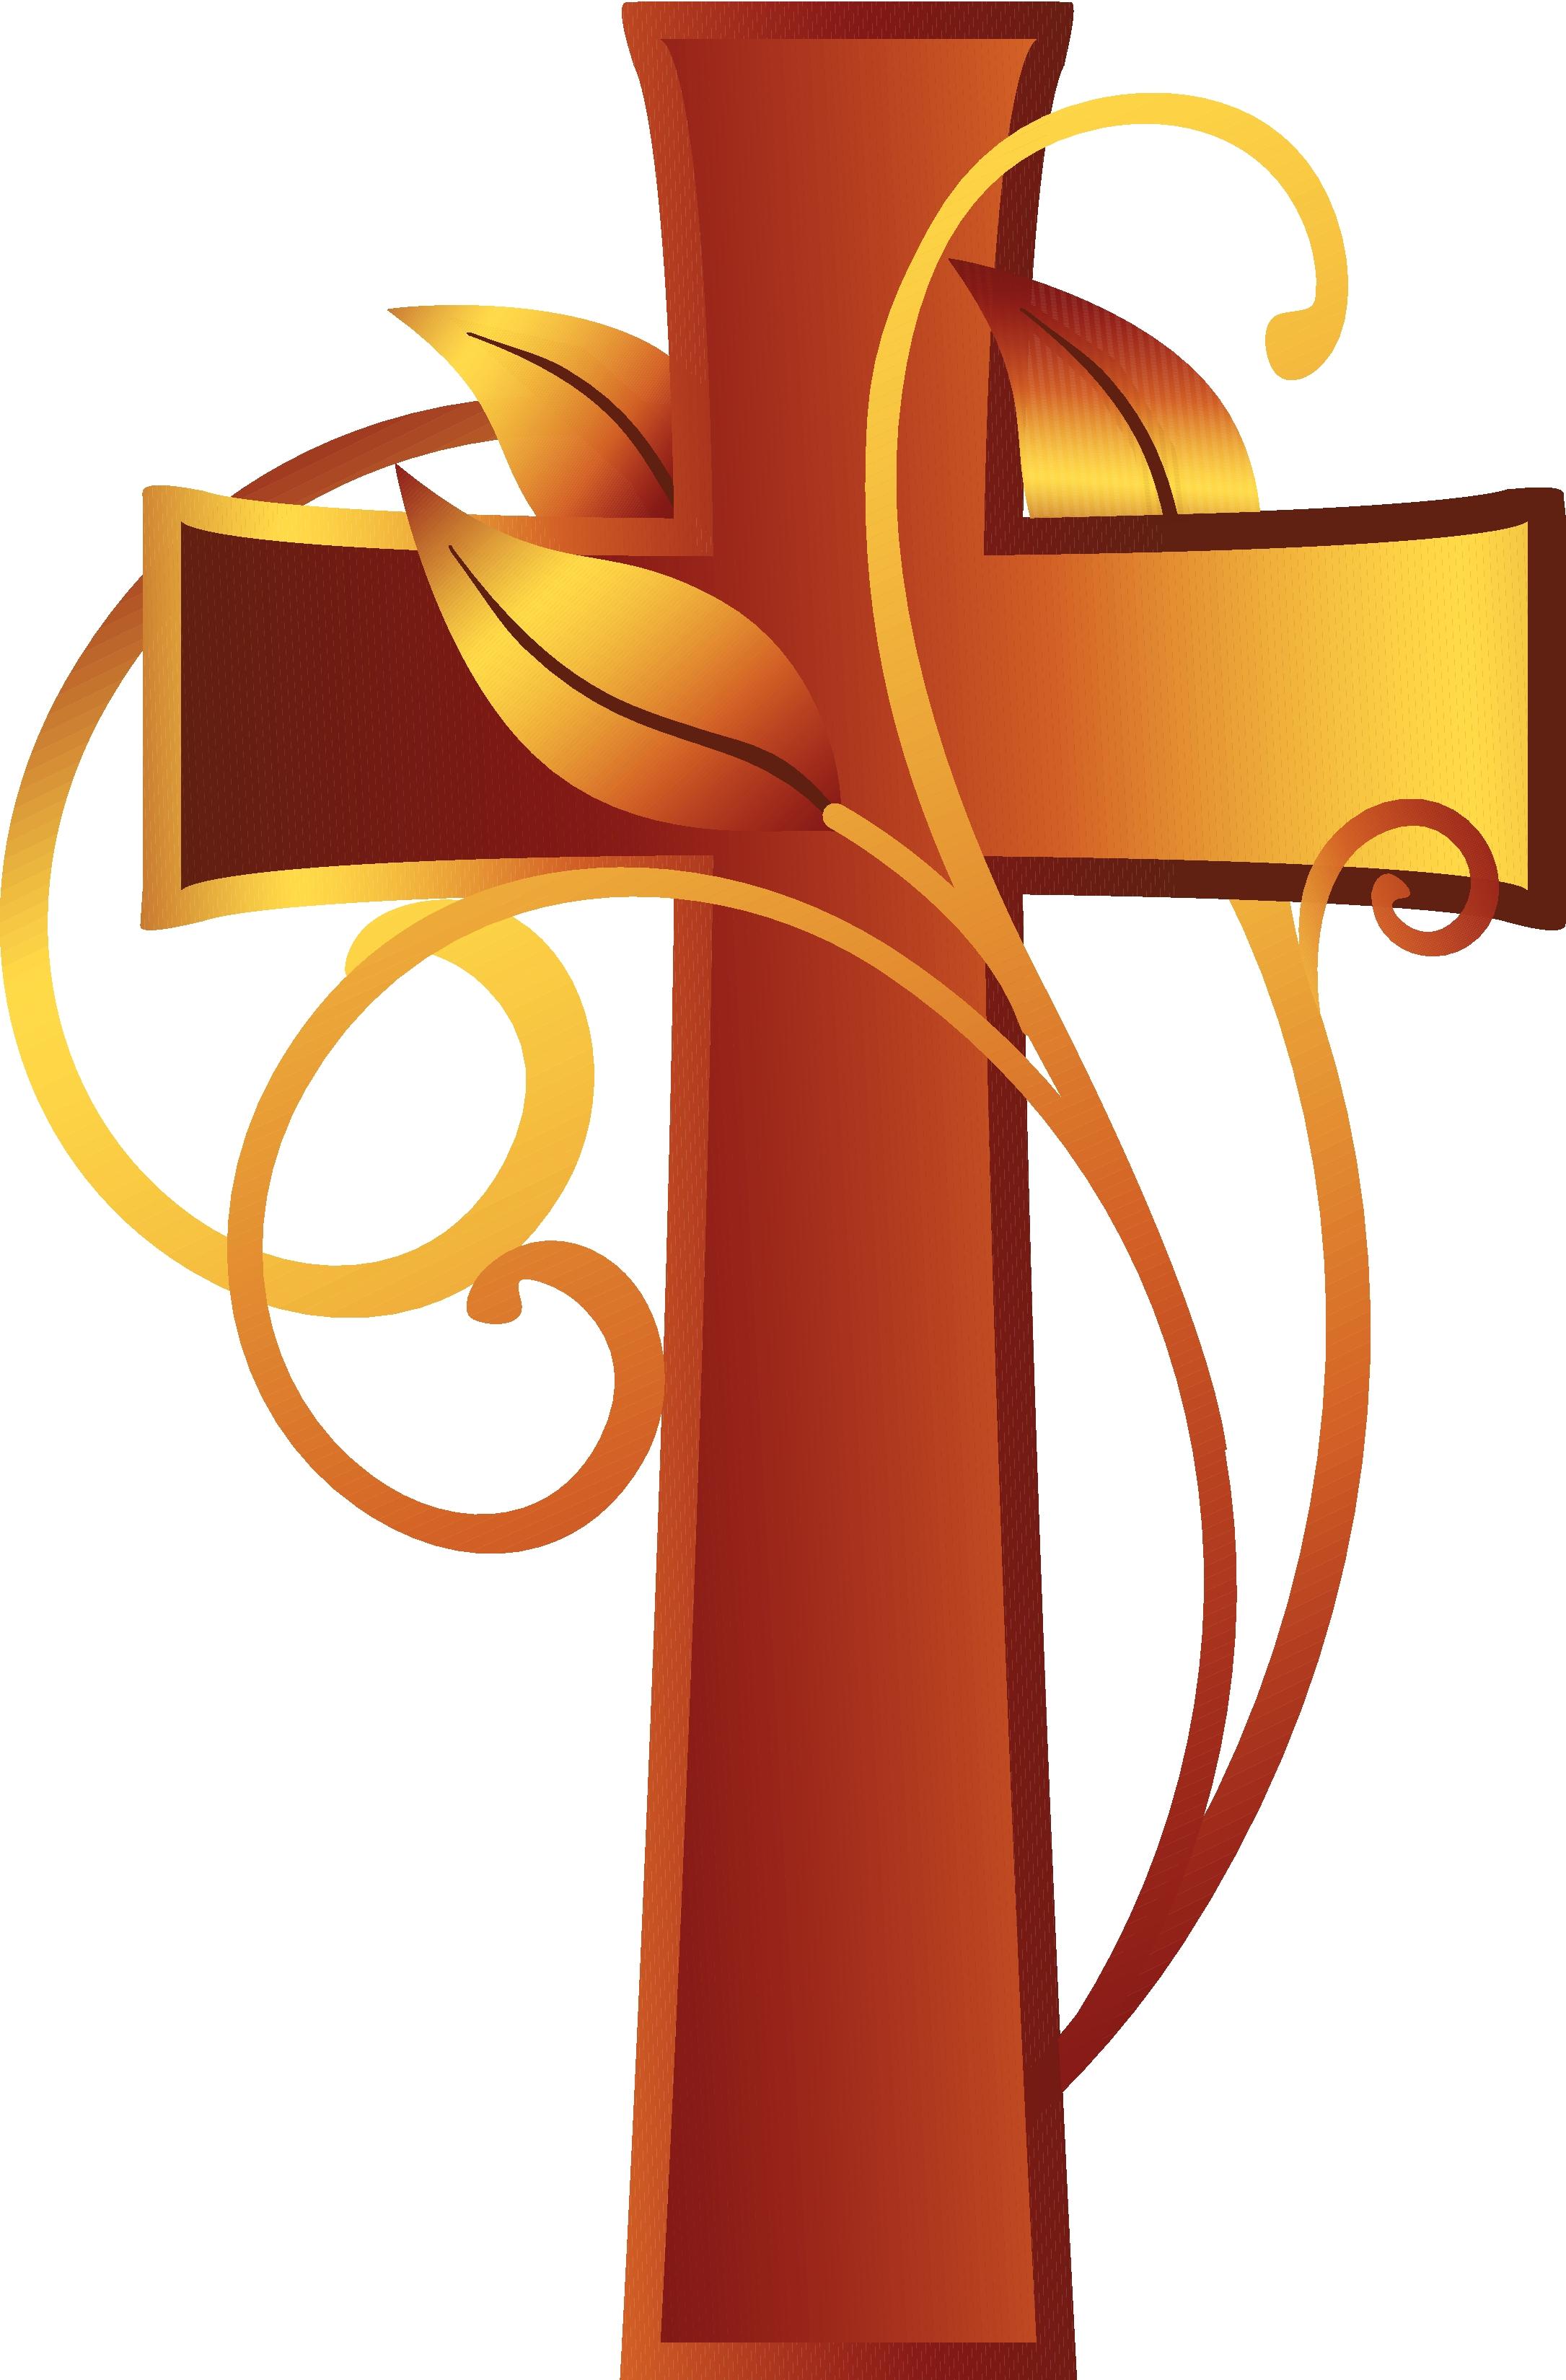 Free religious cross clip art free clipa-Free religious cross clip art free clipart downloads clip art 2-17